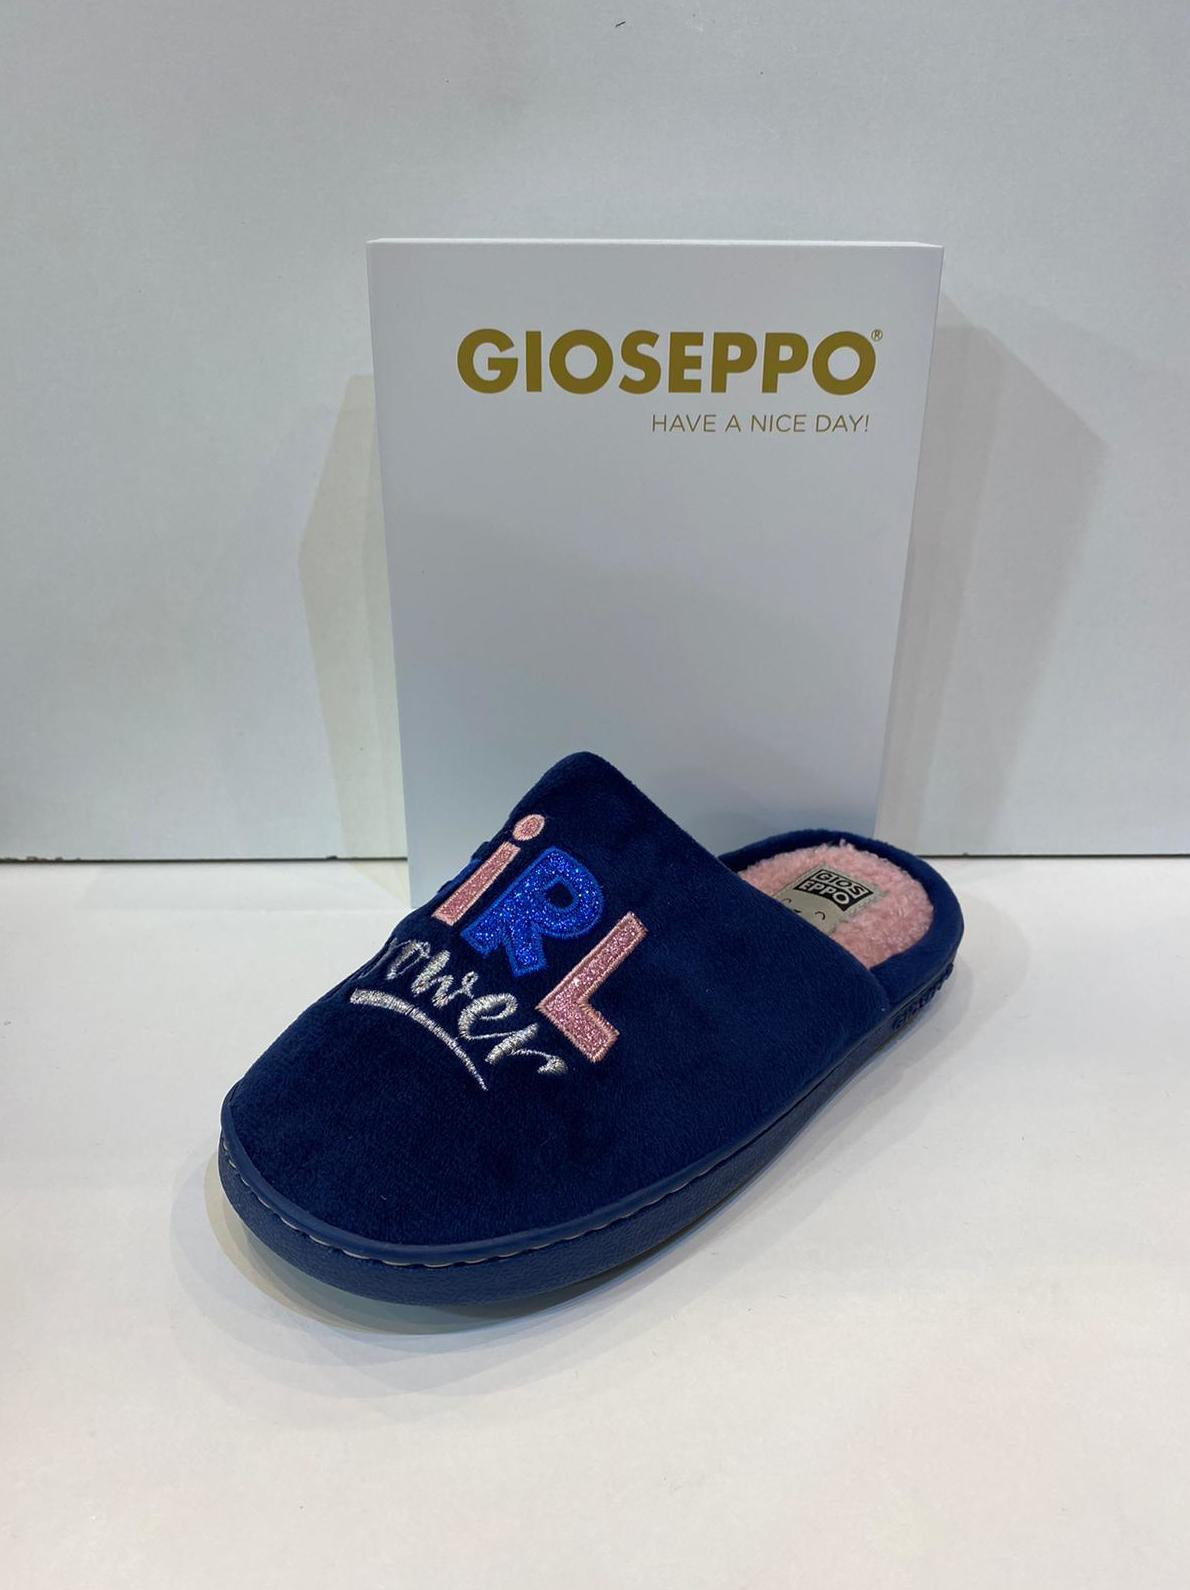 Espardenya de nena, de la marca Gioseppo, plantilla encoixinada i sola de goma 16.95